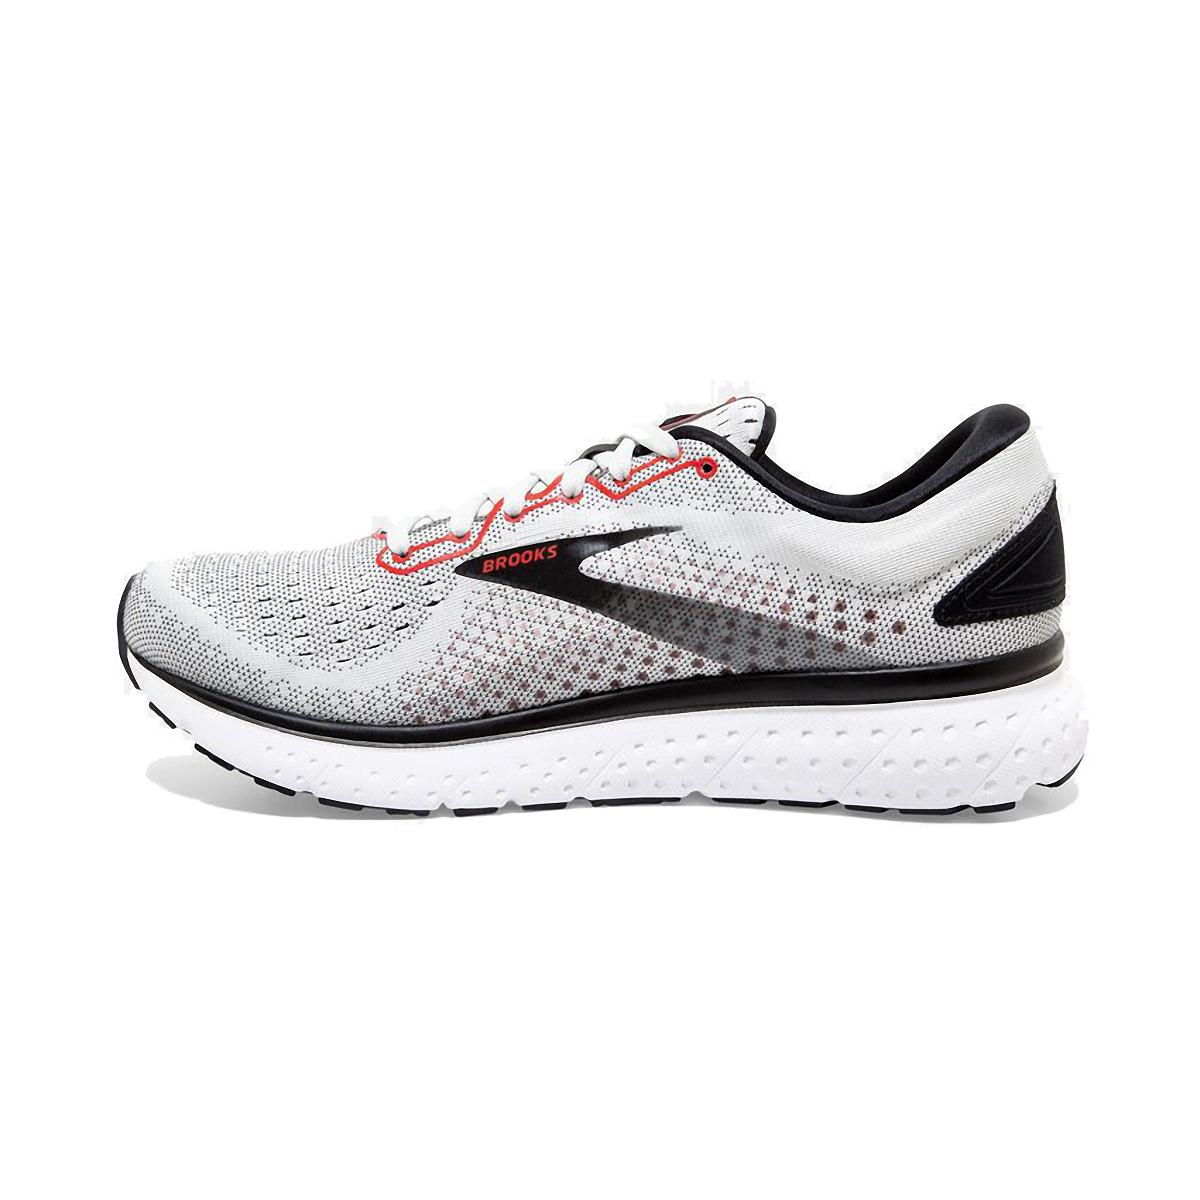 Men's Brooks Glycerin 18 Running Shoe - Color: White/Black/Red - Size: 7 - Width: Regular, White/Black/Red, large, image 2